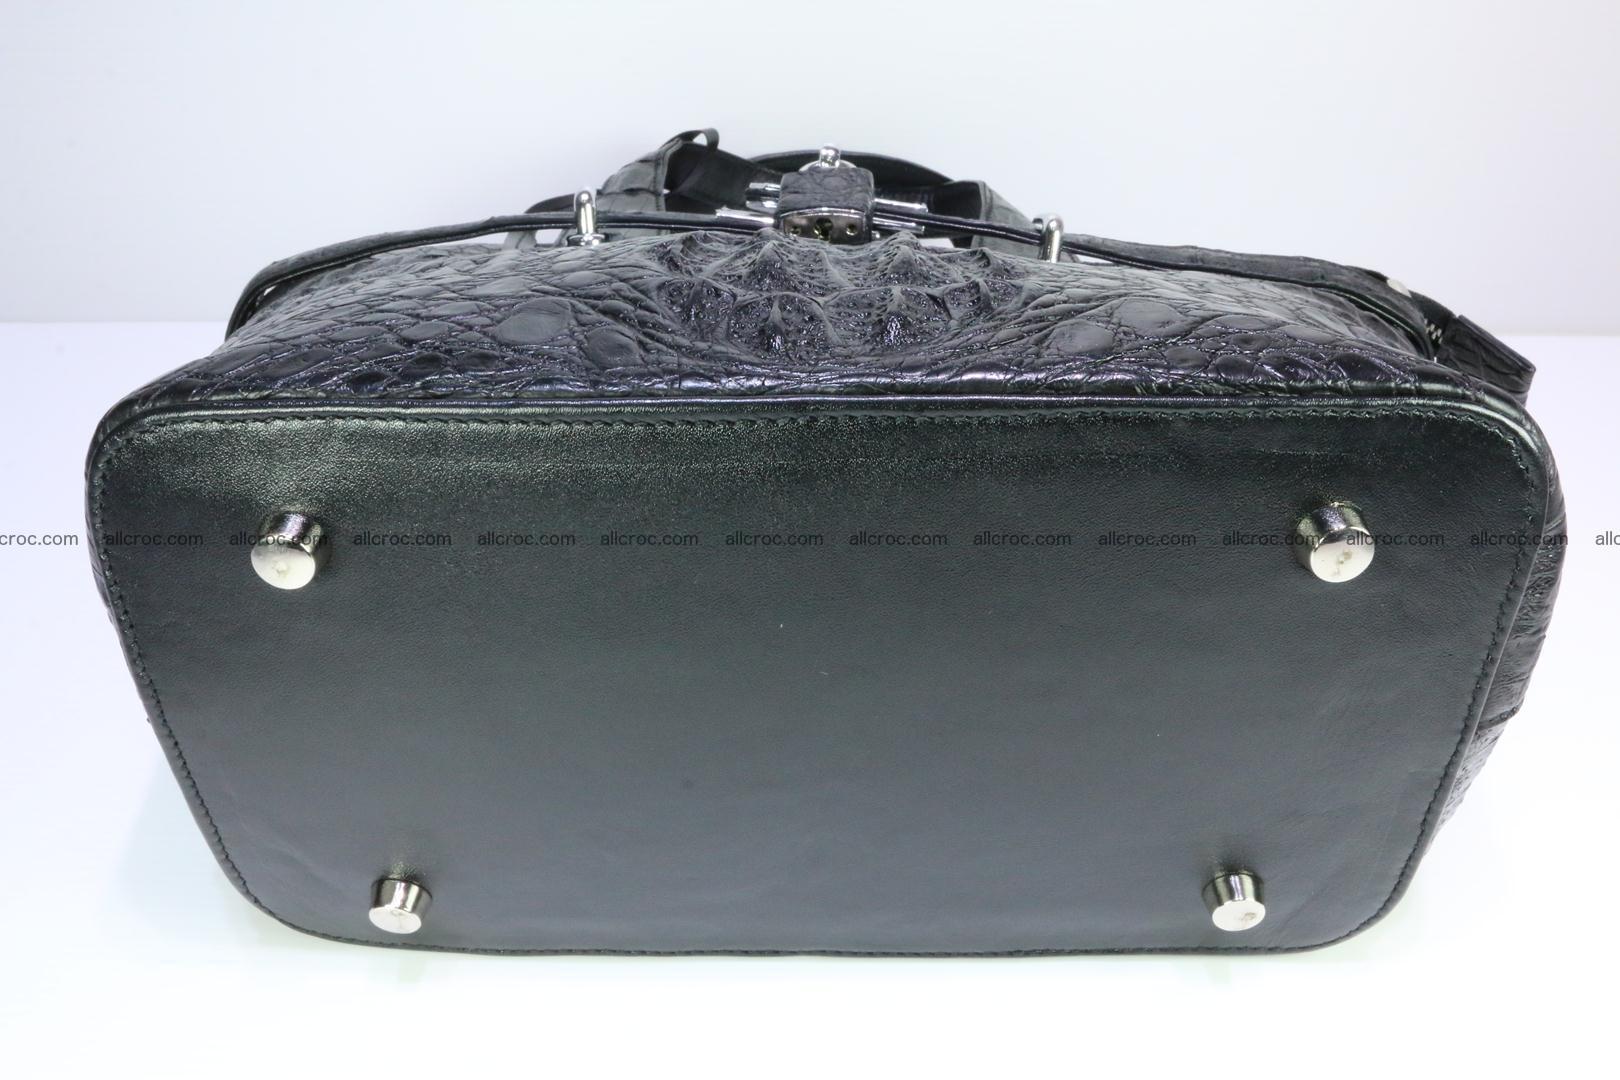 Genuine crocodile handbag for ladies 051 Foto 12